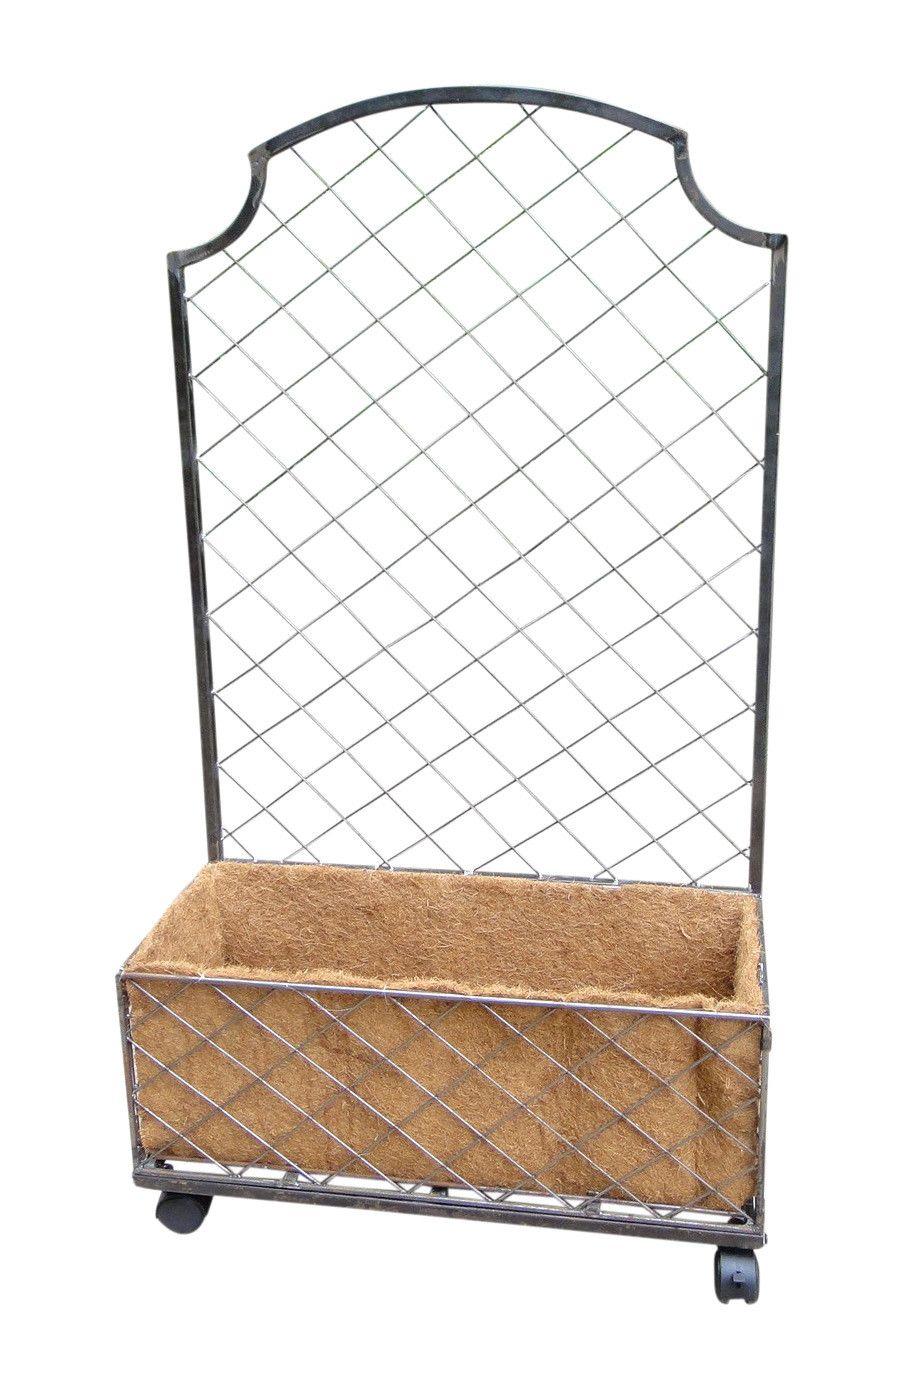 Wayfair Com Online Home Store For Furniture Decor Outdoors More Wayfair Planter Trellis